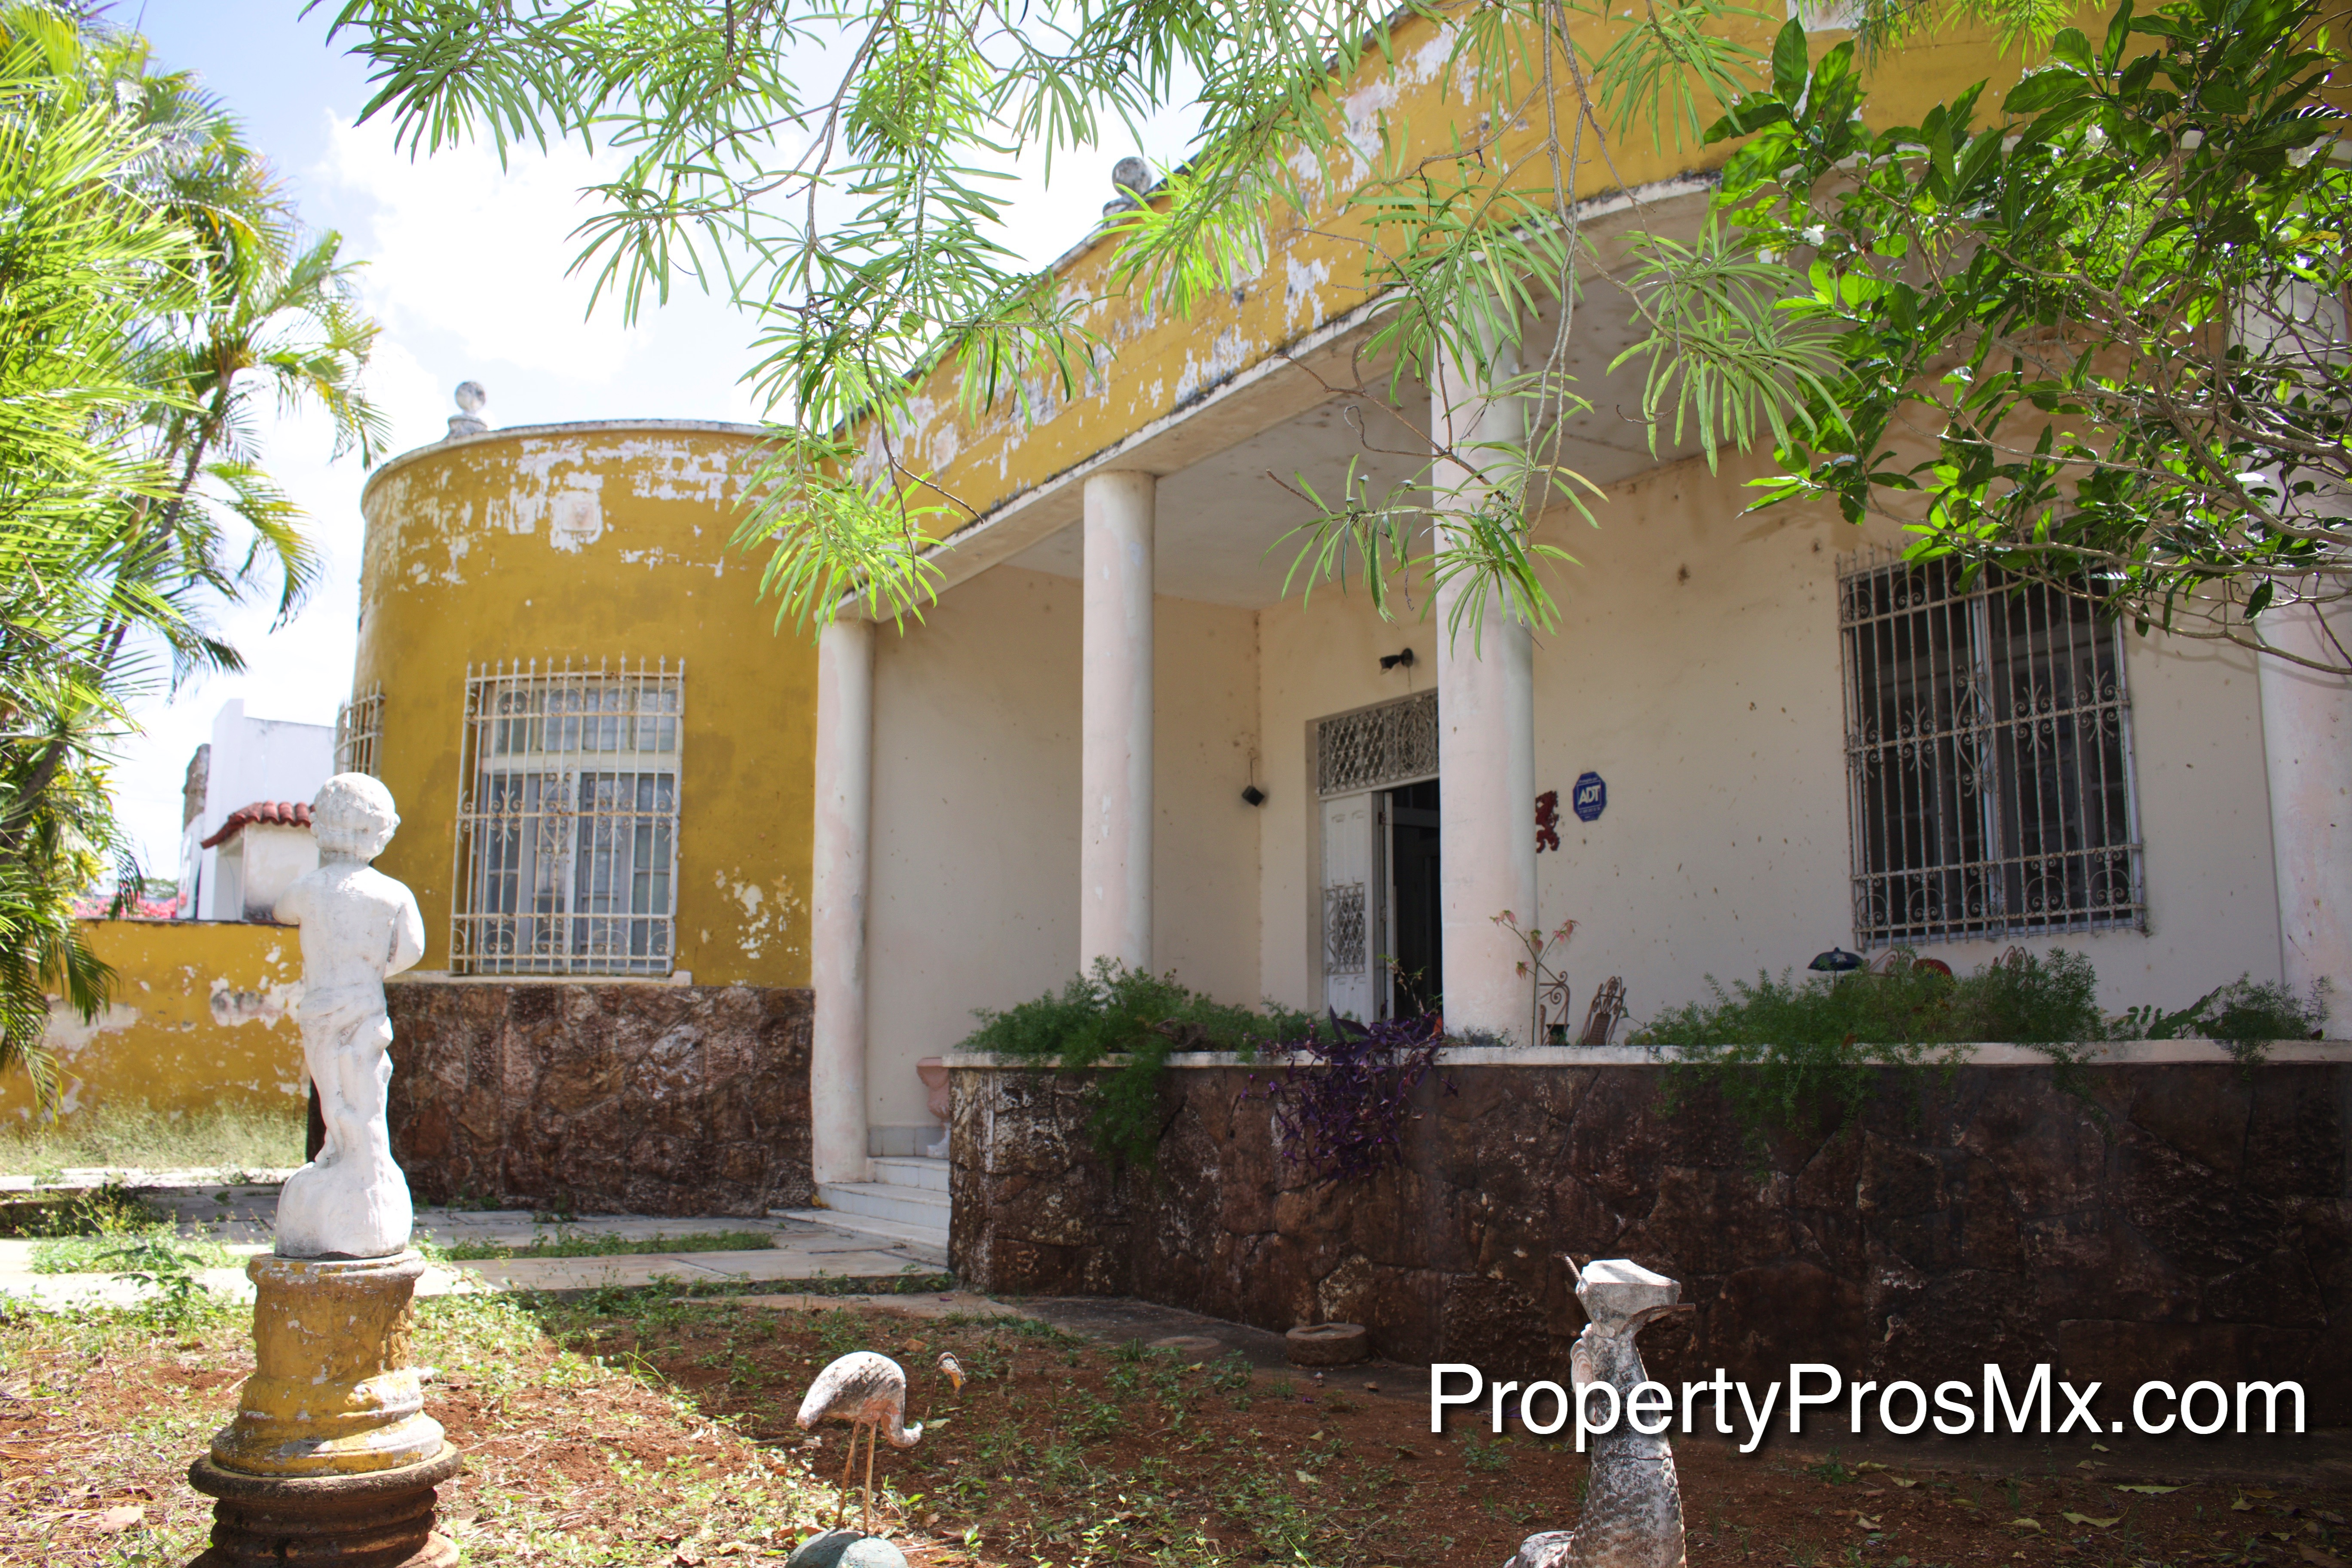 Casona Colonial Alcala Martin - PropertyProsMX